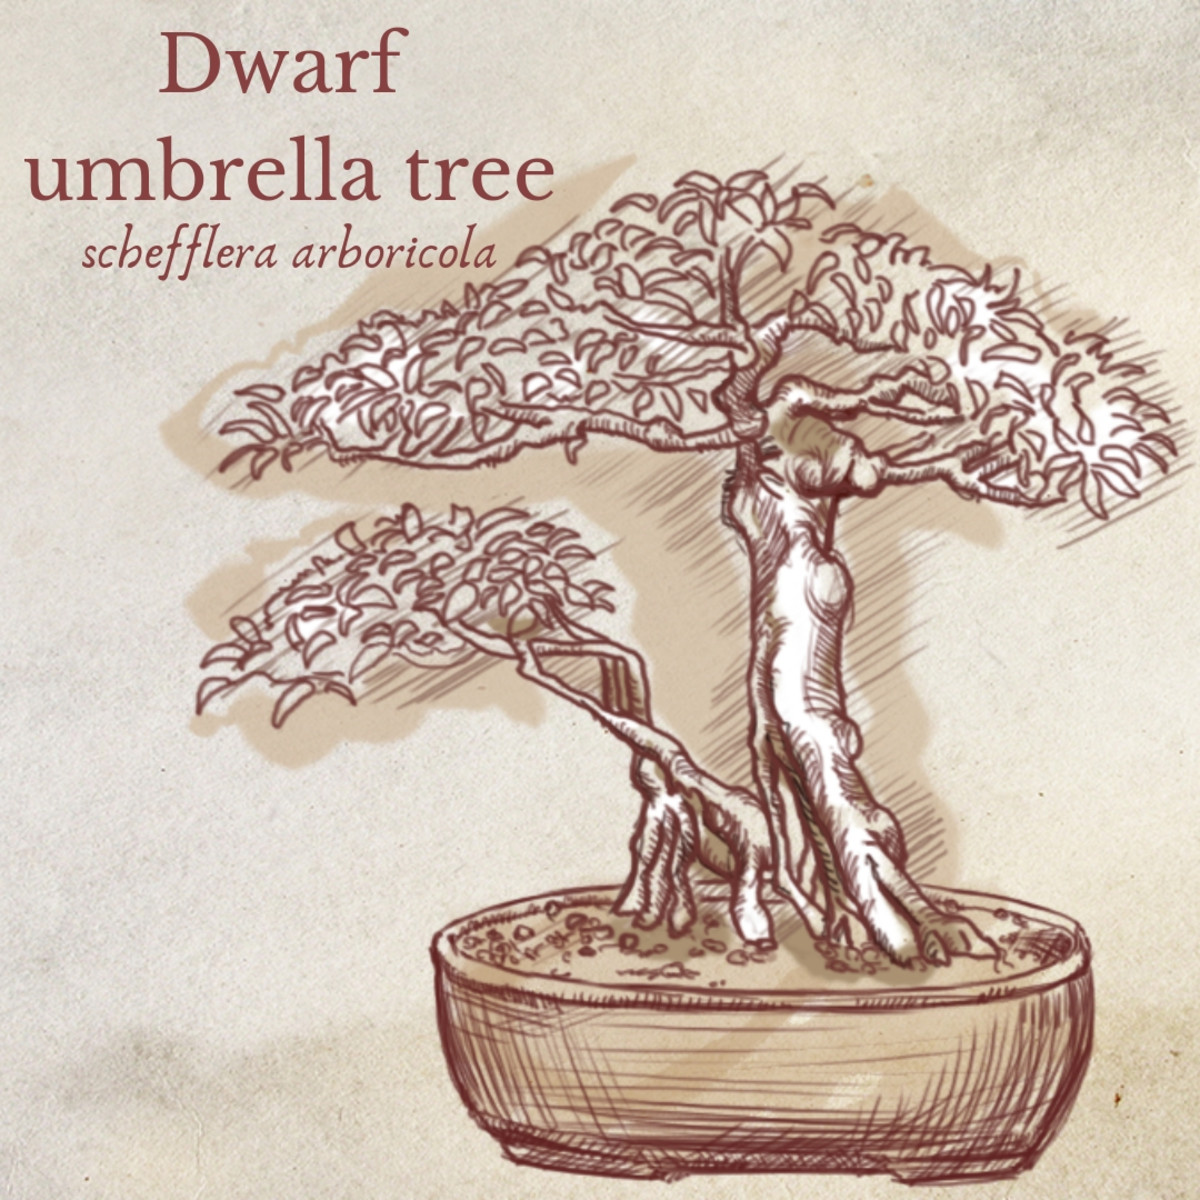 Illustration of Dwarf Umbrella Tree